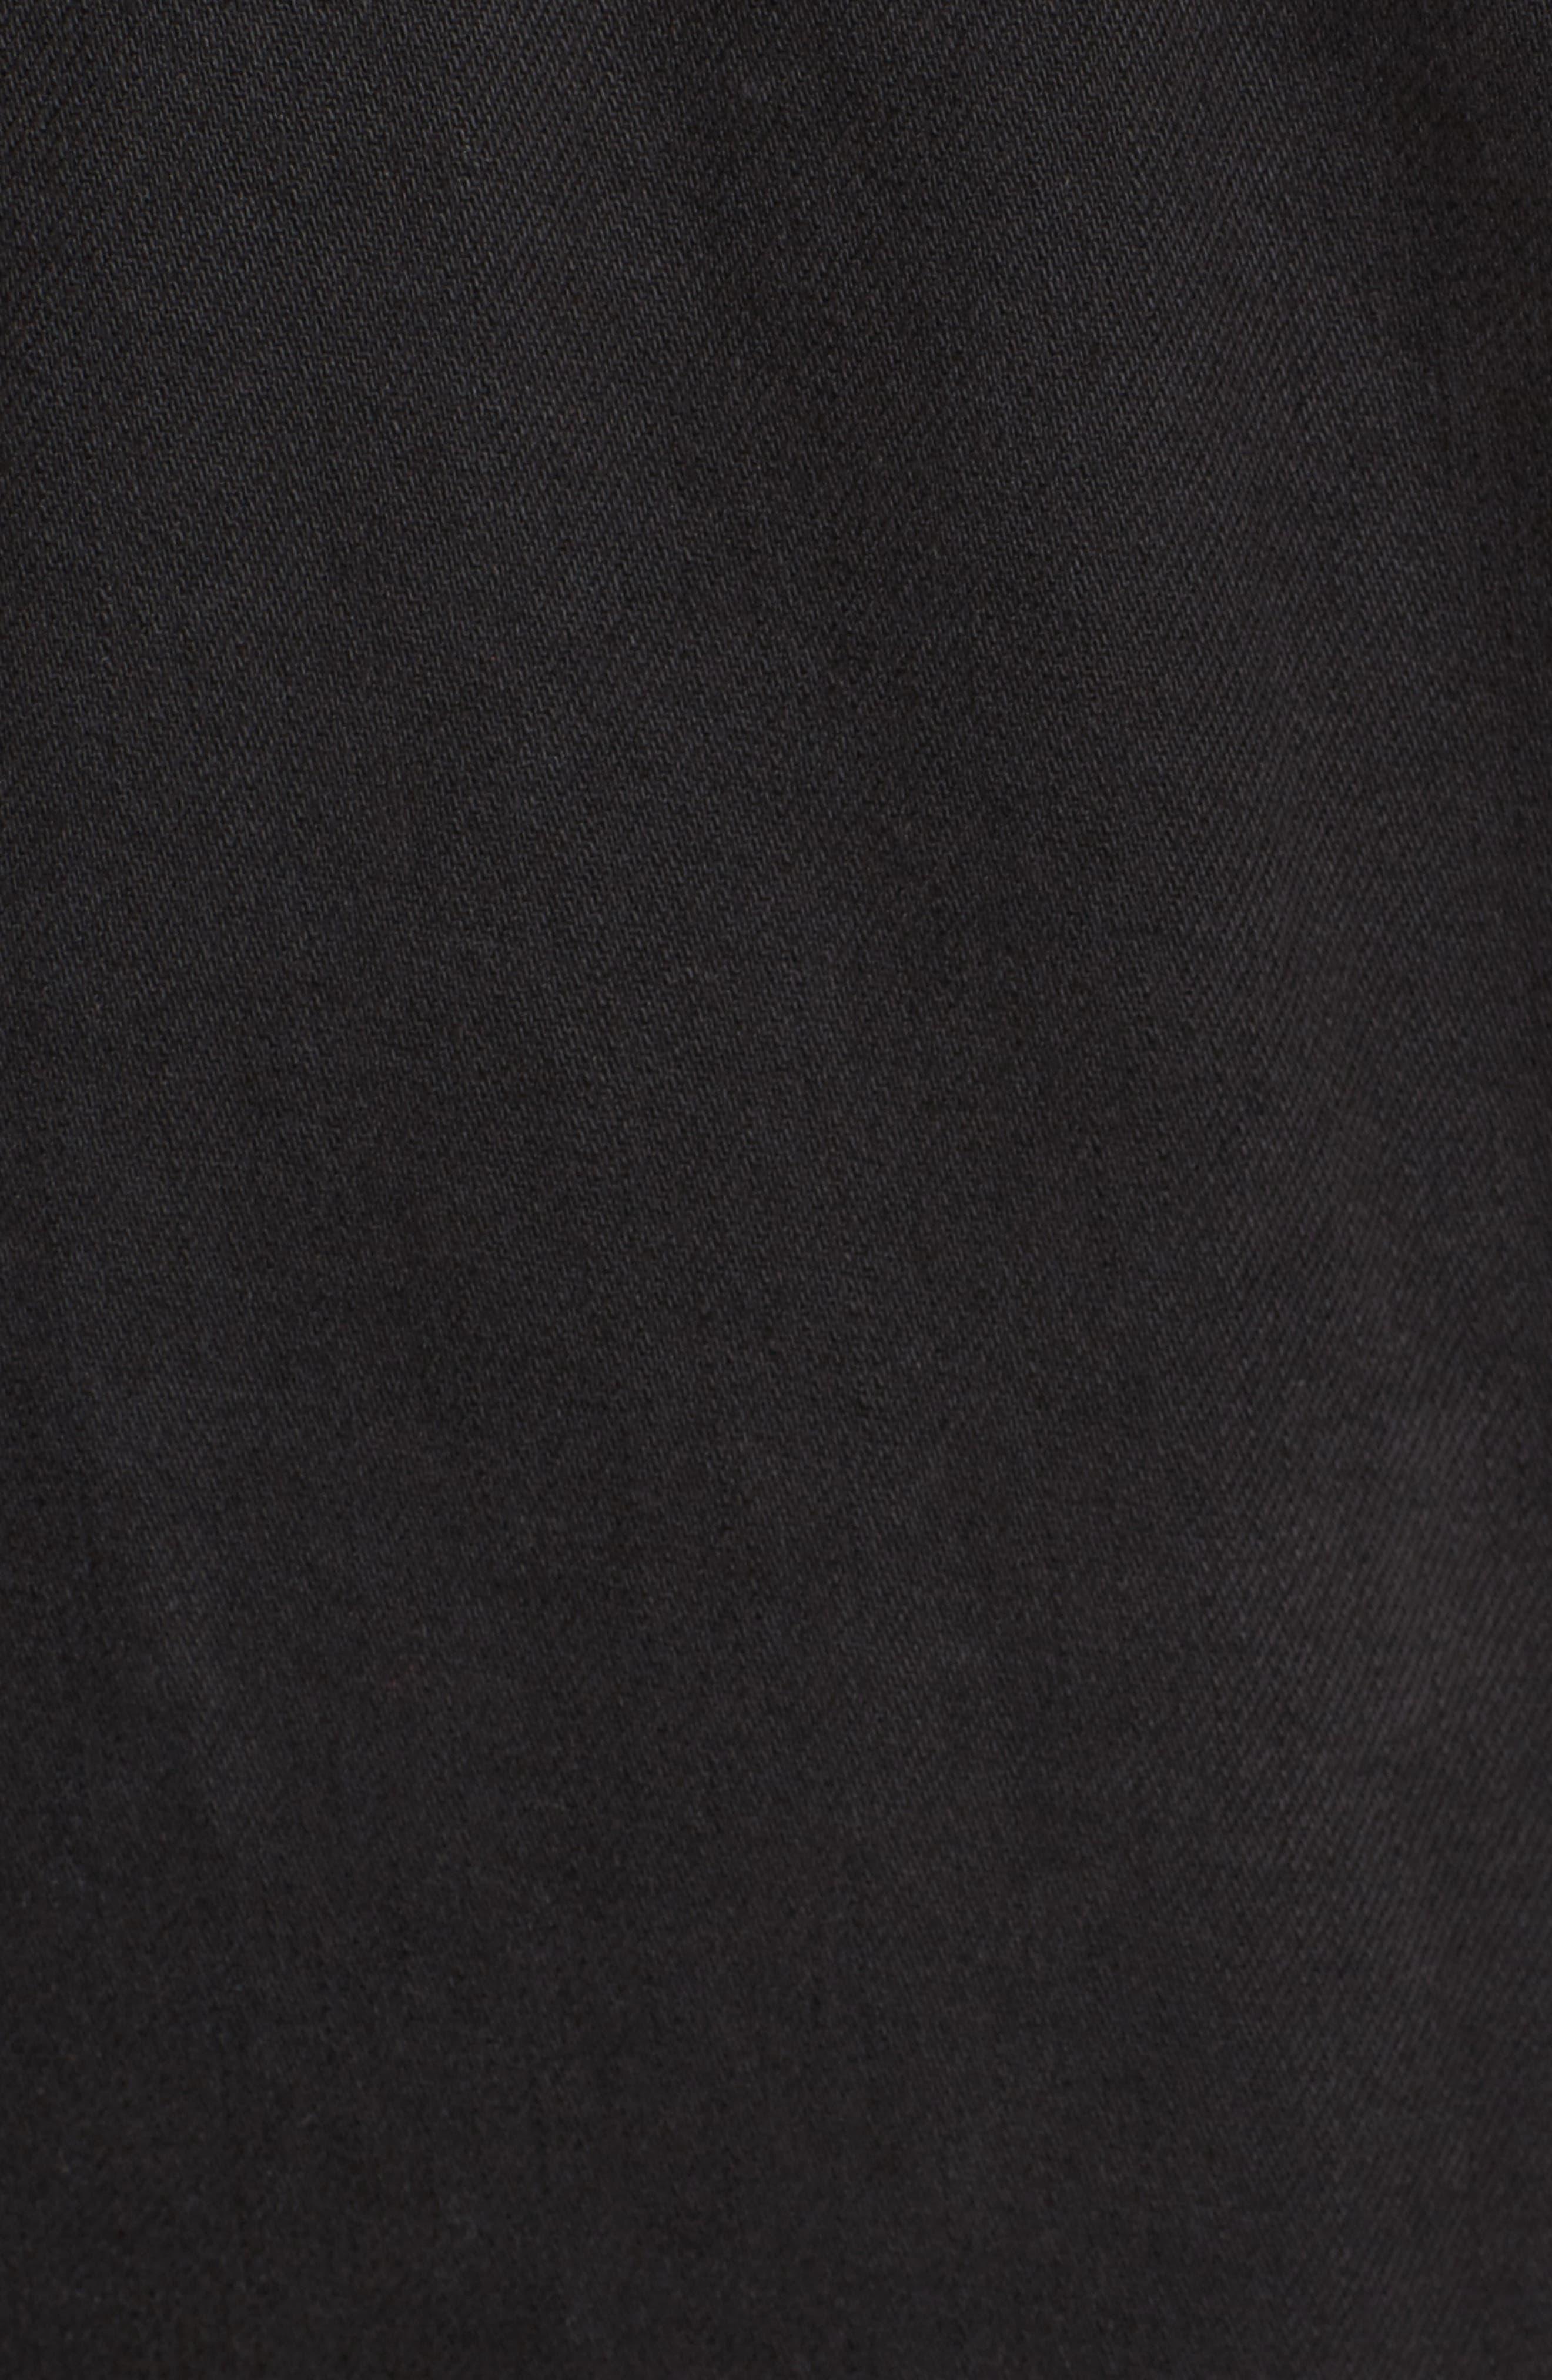 Lace-Up Denim Jacket,                             Alternate thumbnail 5, color,                             Black